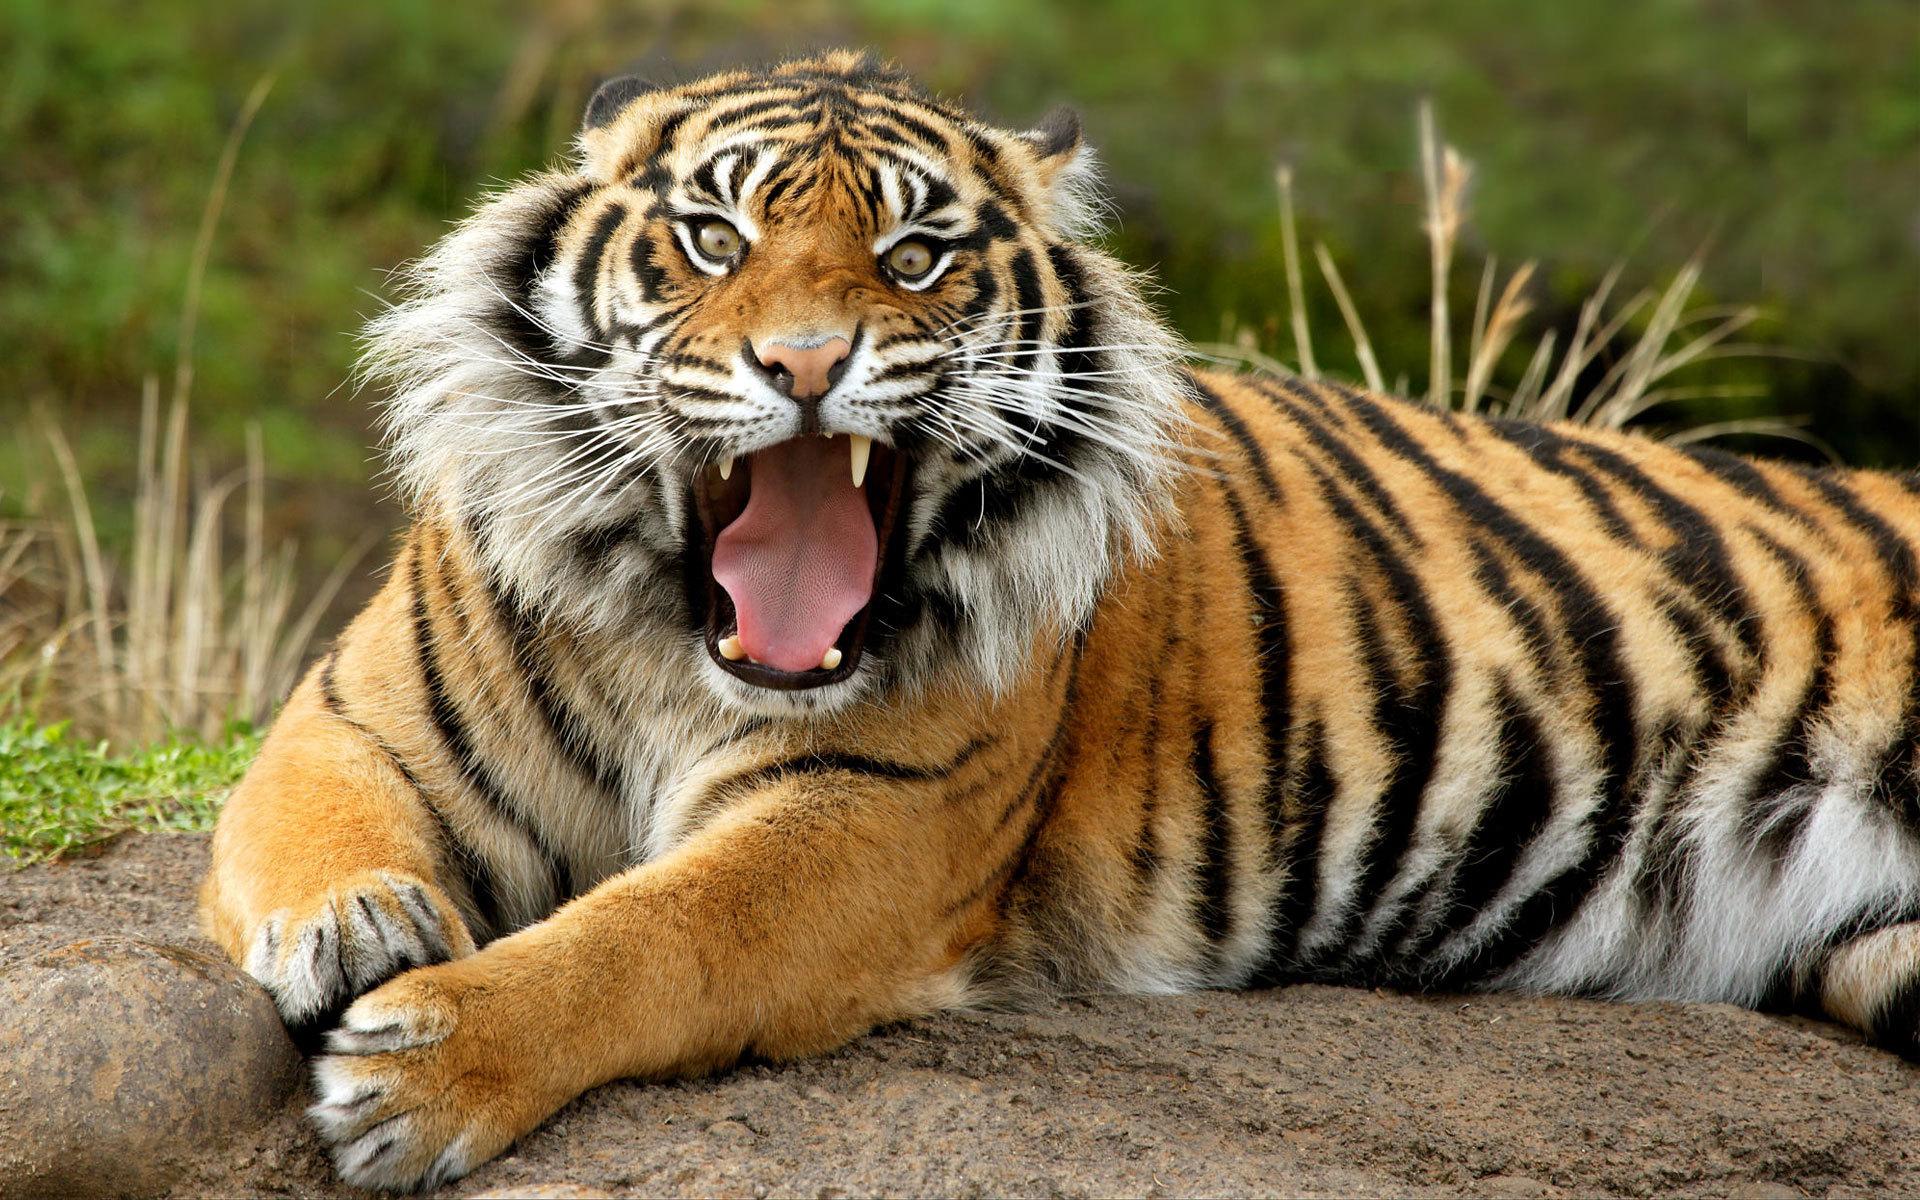 Tiger Image